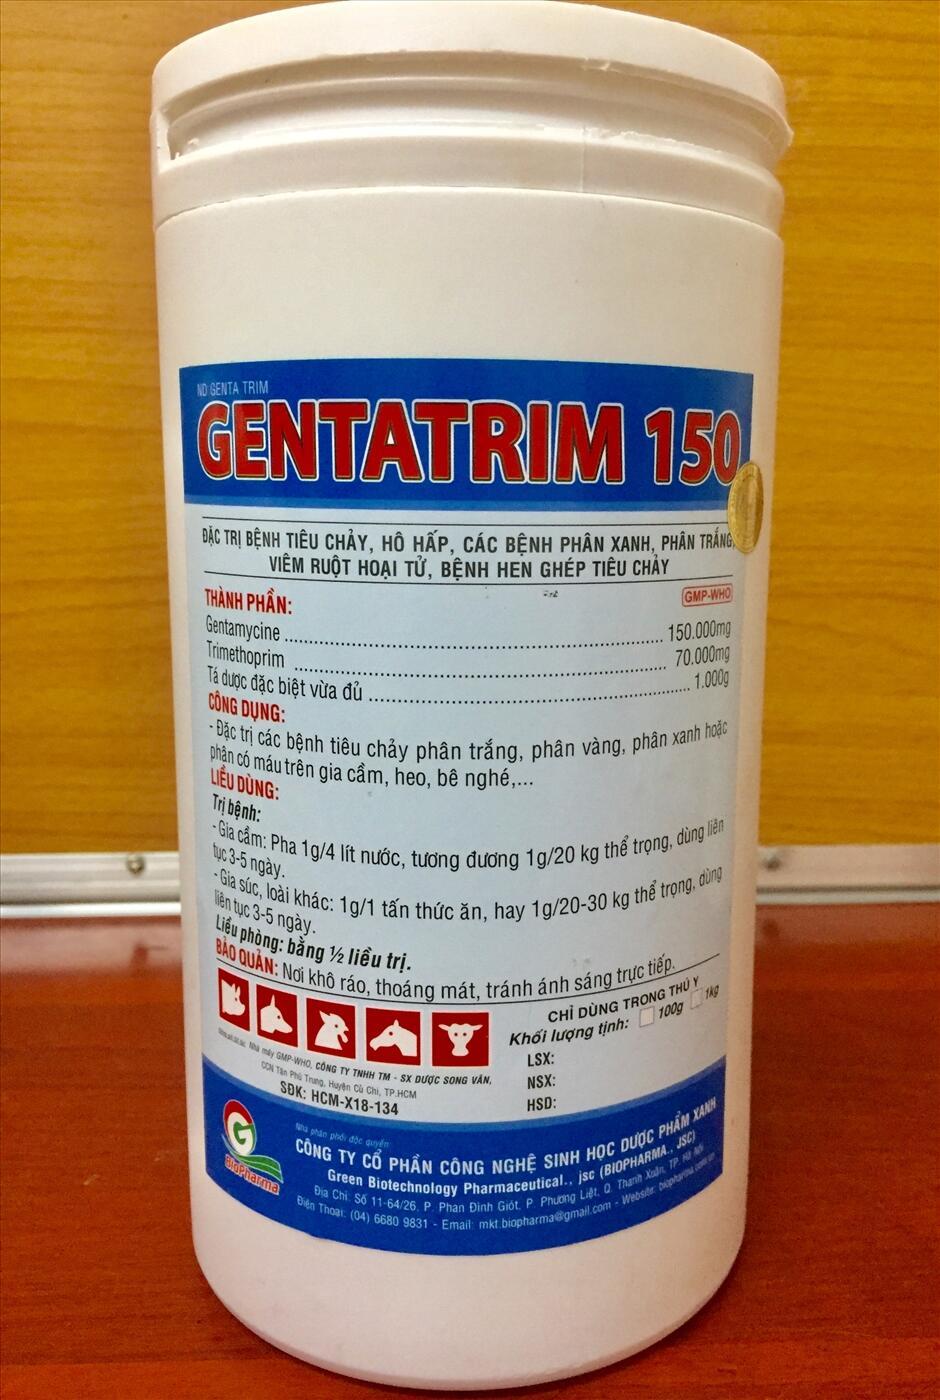 Gentatrim150